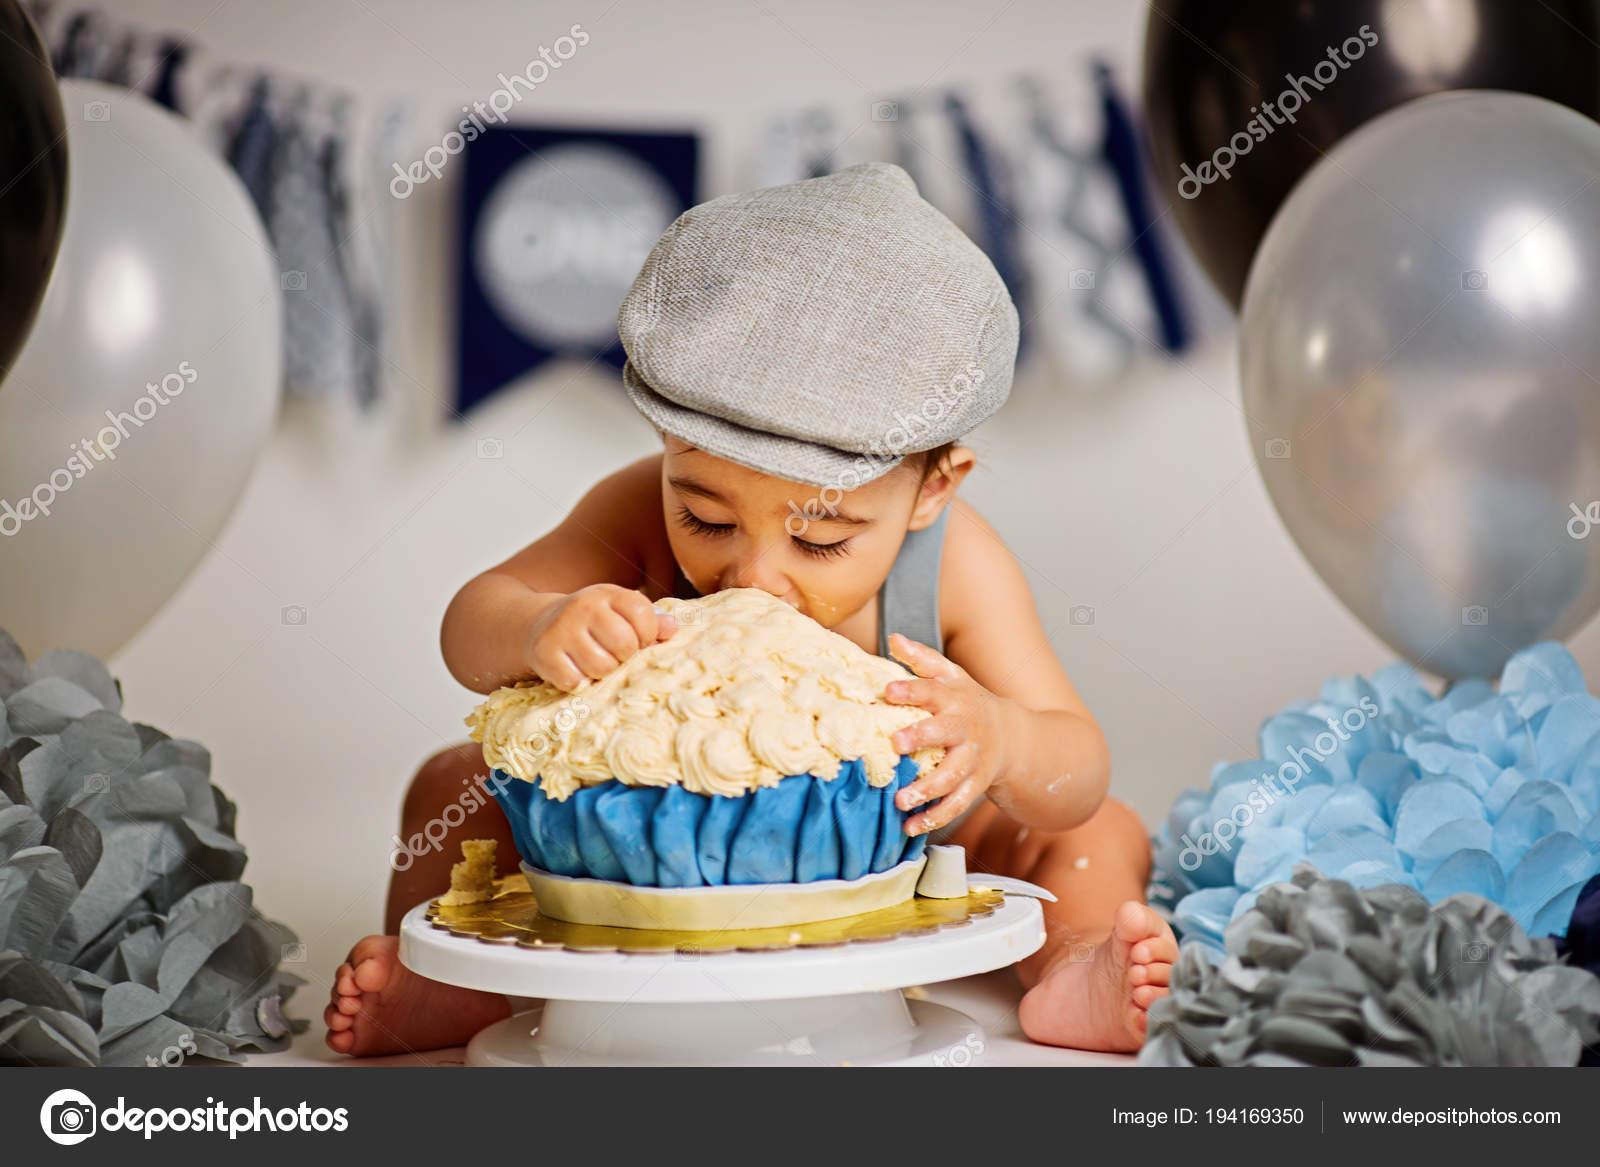 One Year Old Baby Boy Smashing Blue Iced Birthday Cake Stock Photo Image By C Pavlovski Info Gmail Com 194169350